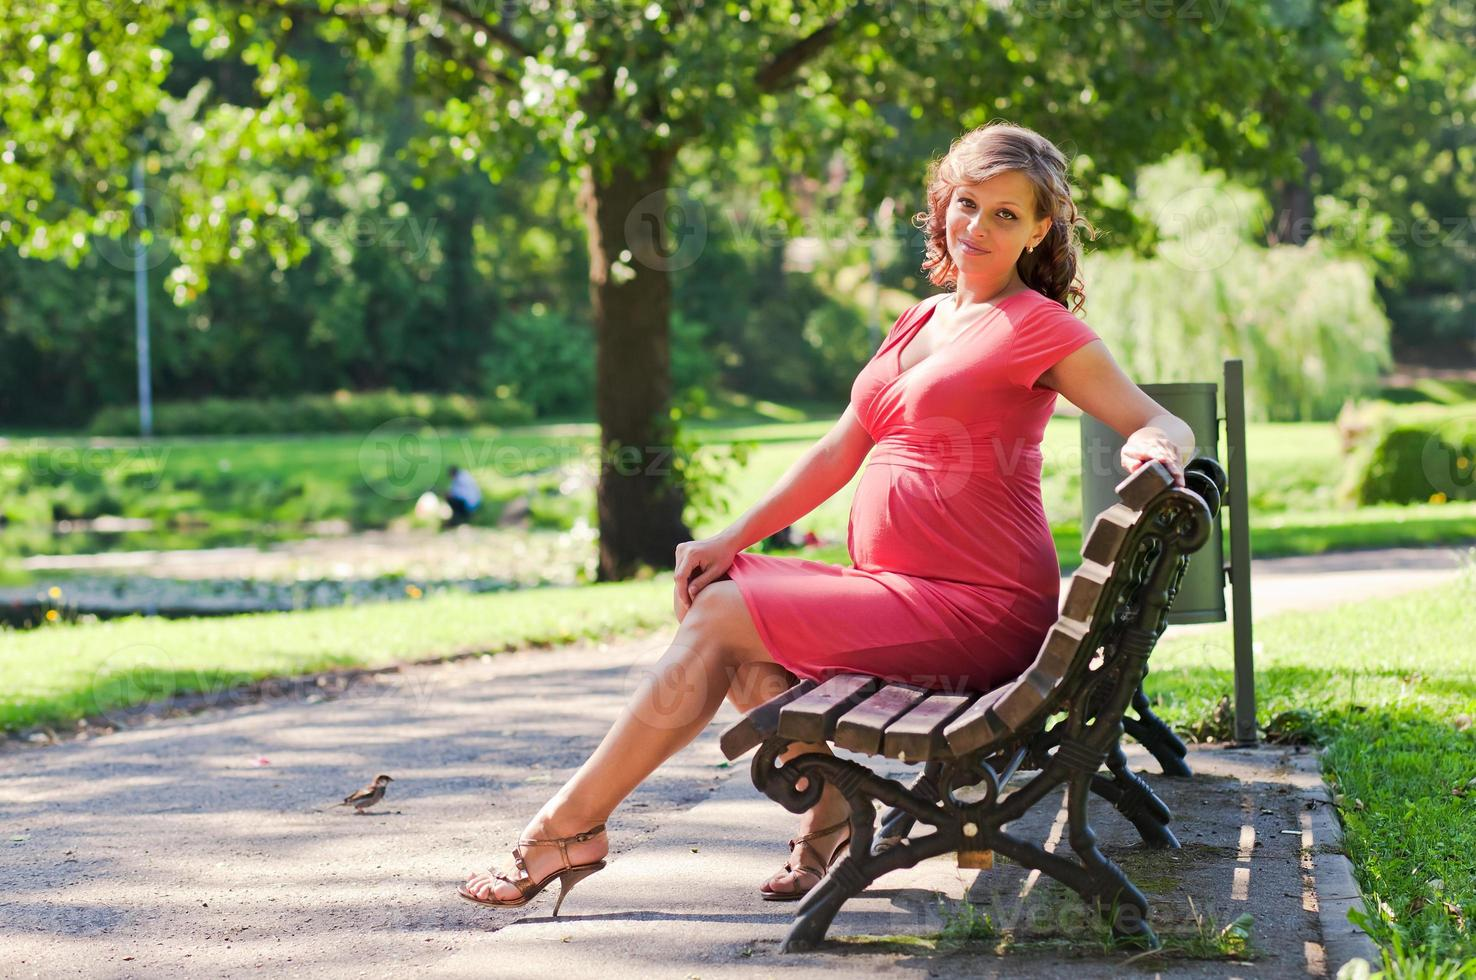 jonge zwangere vrouw in park foto